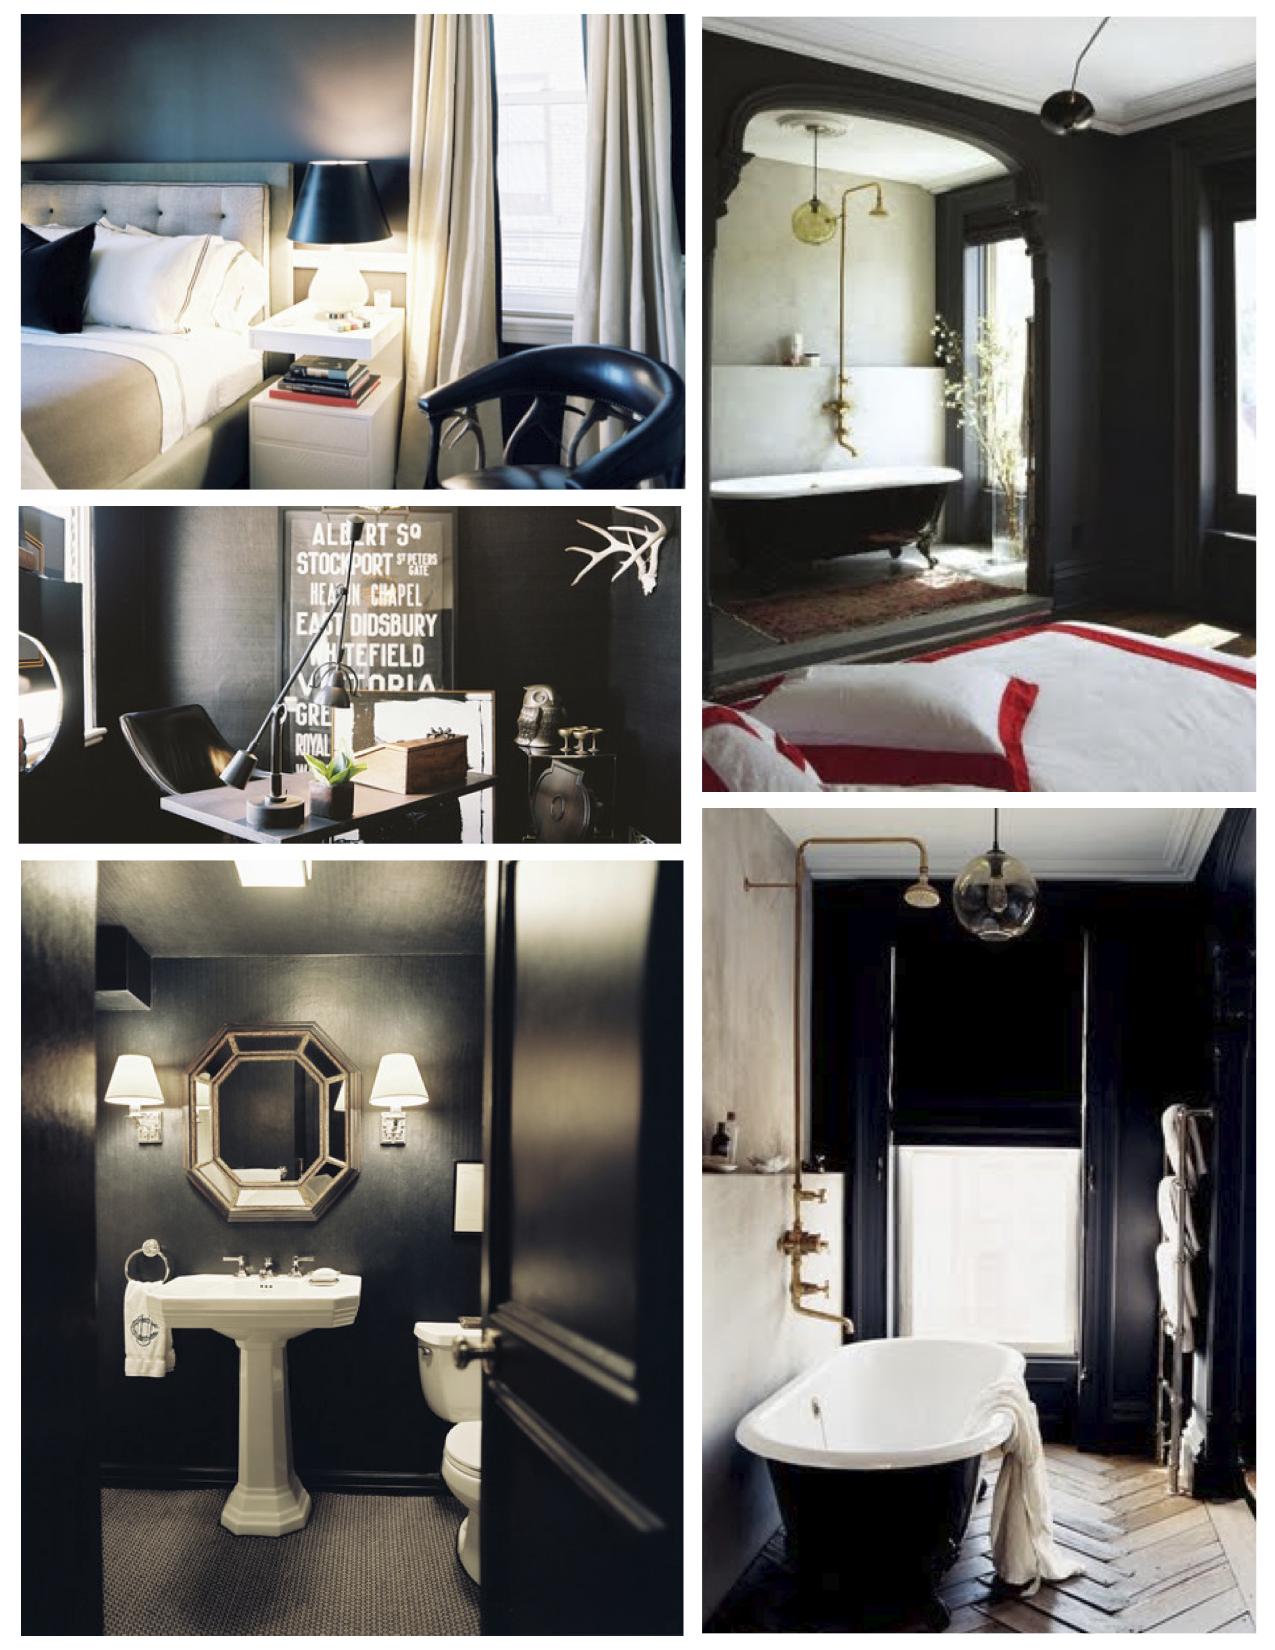 Phenomenal Interior Color Inspirations The Bold Dramatic Statement Download Free Architecture Designs Grimeyleaguecom